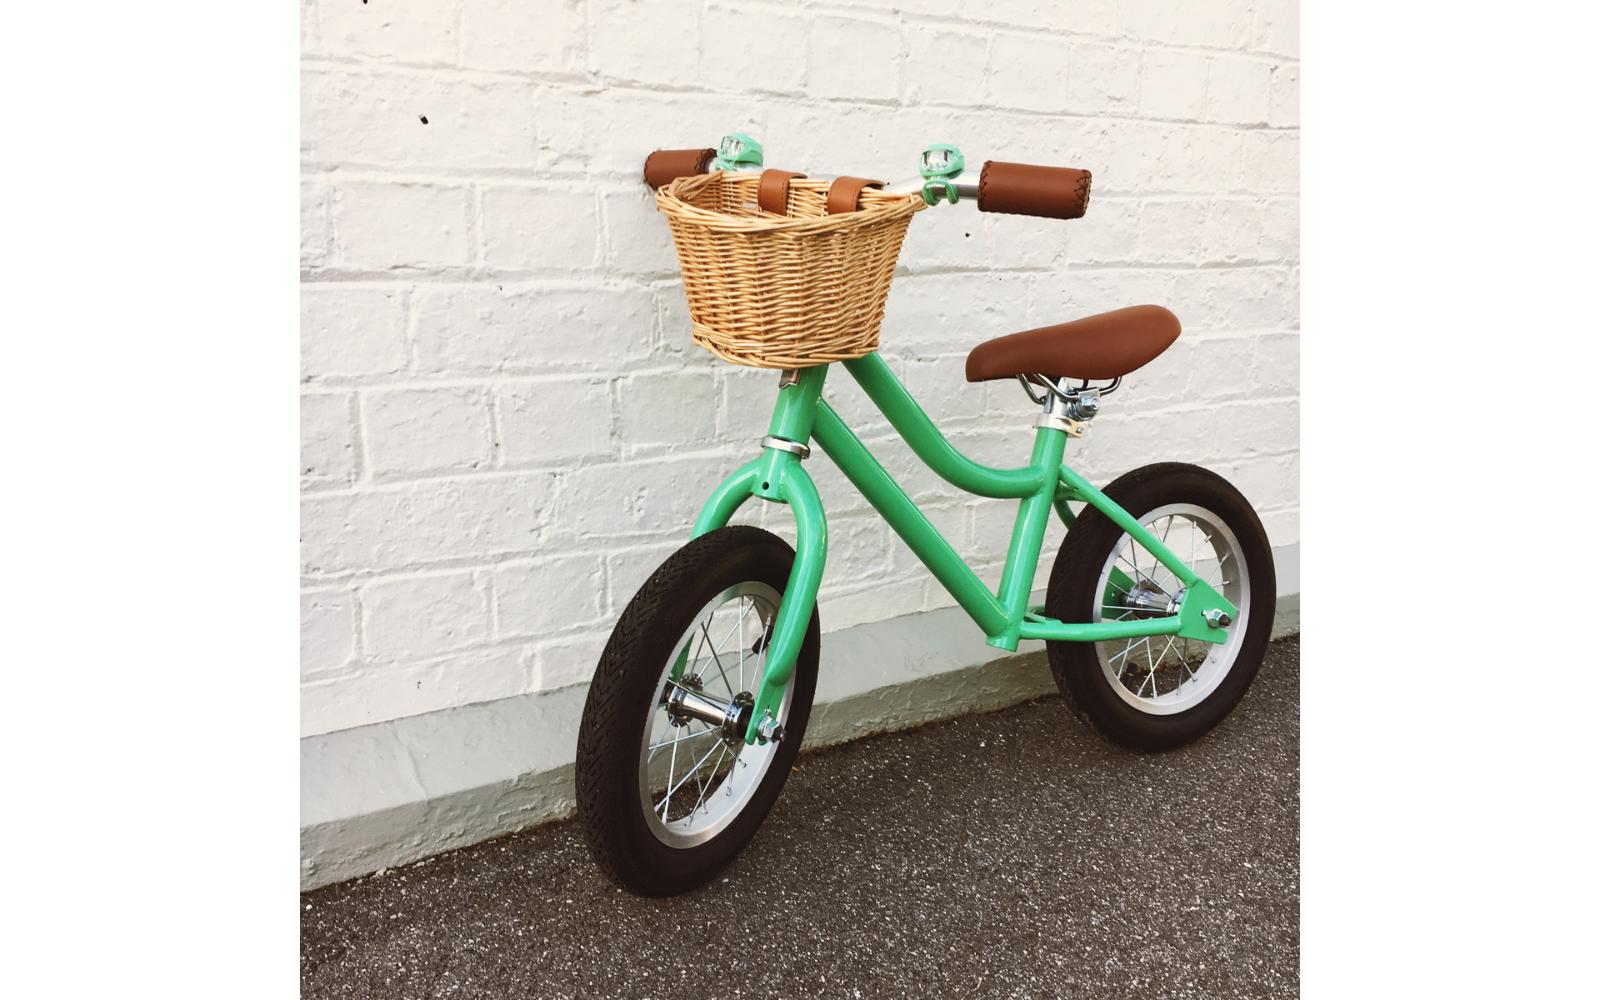 8 25 - Reid ® - Girls Vintage Balance Bike